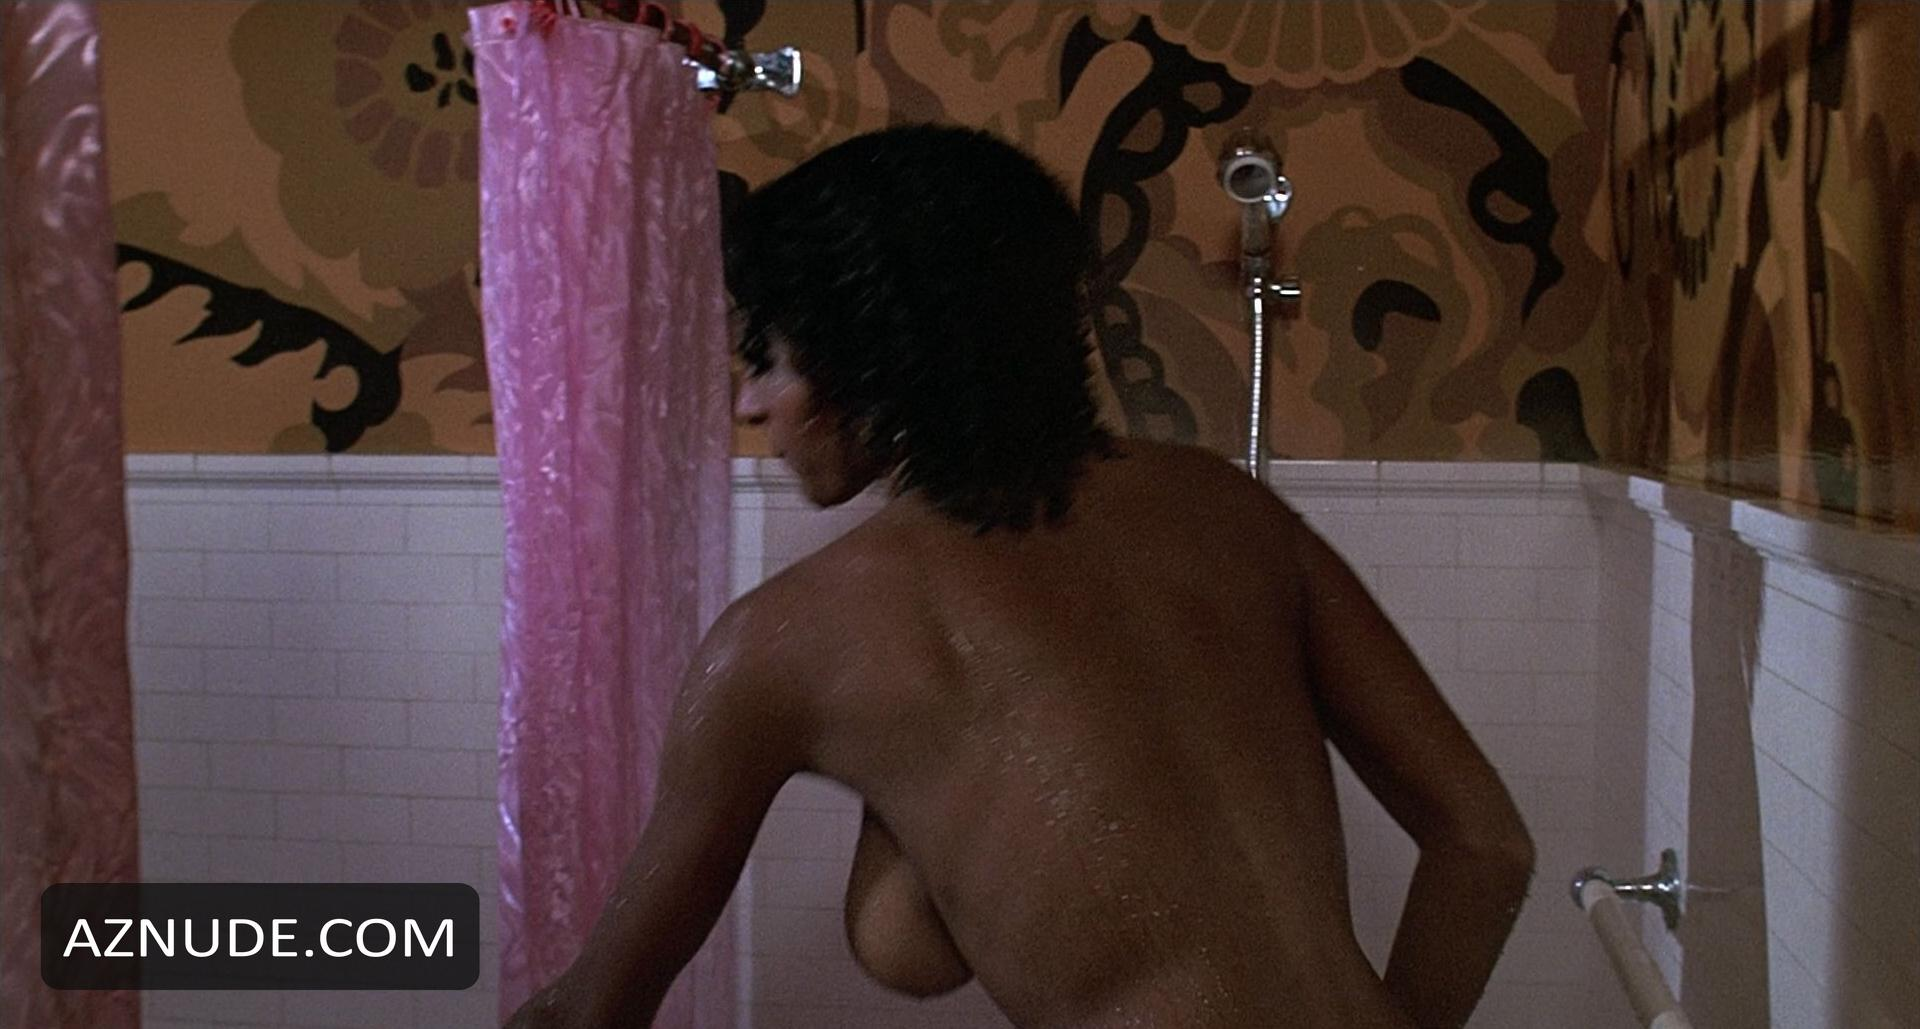 Boston sex tape in hotel room - 3 part 4